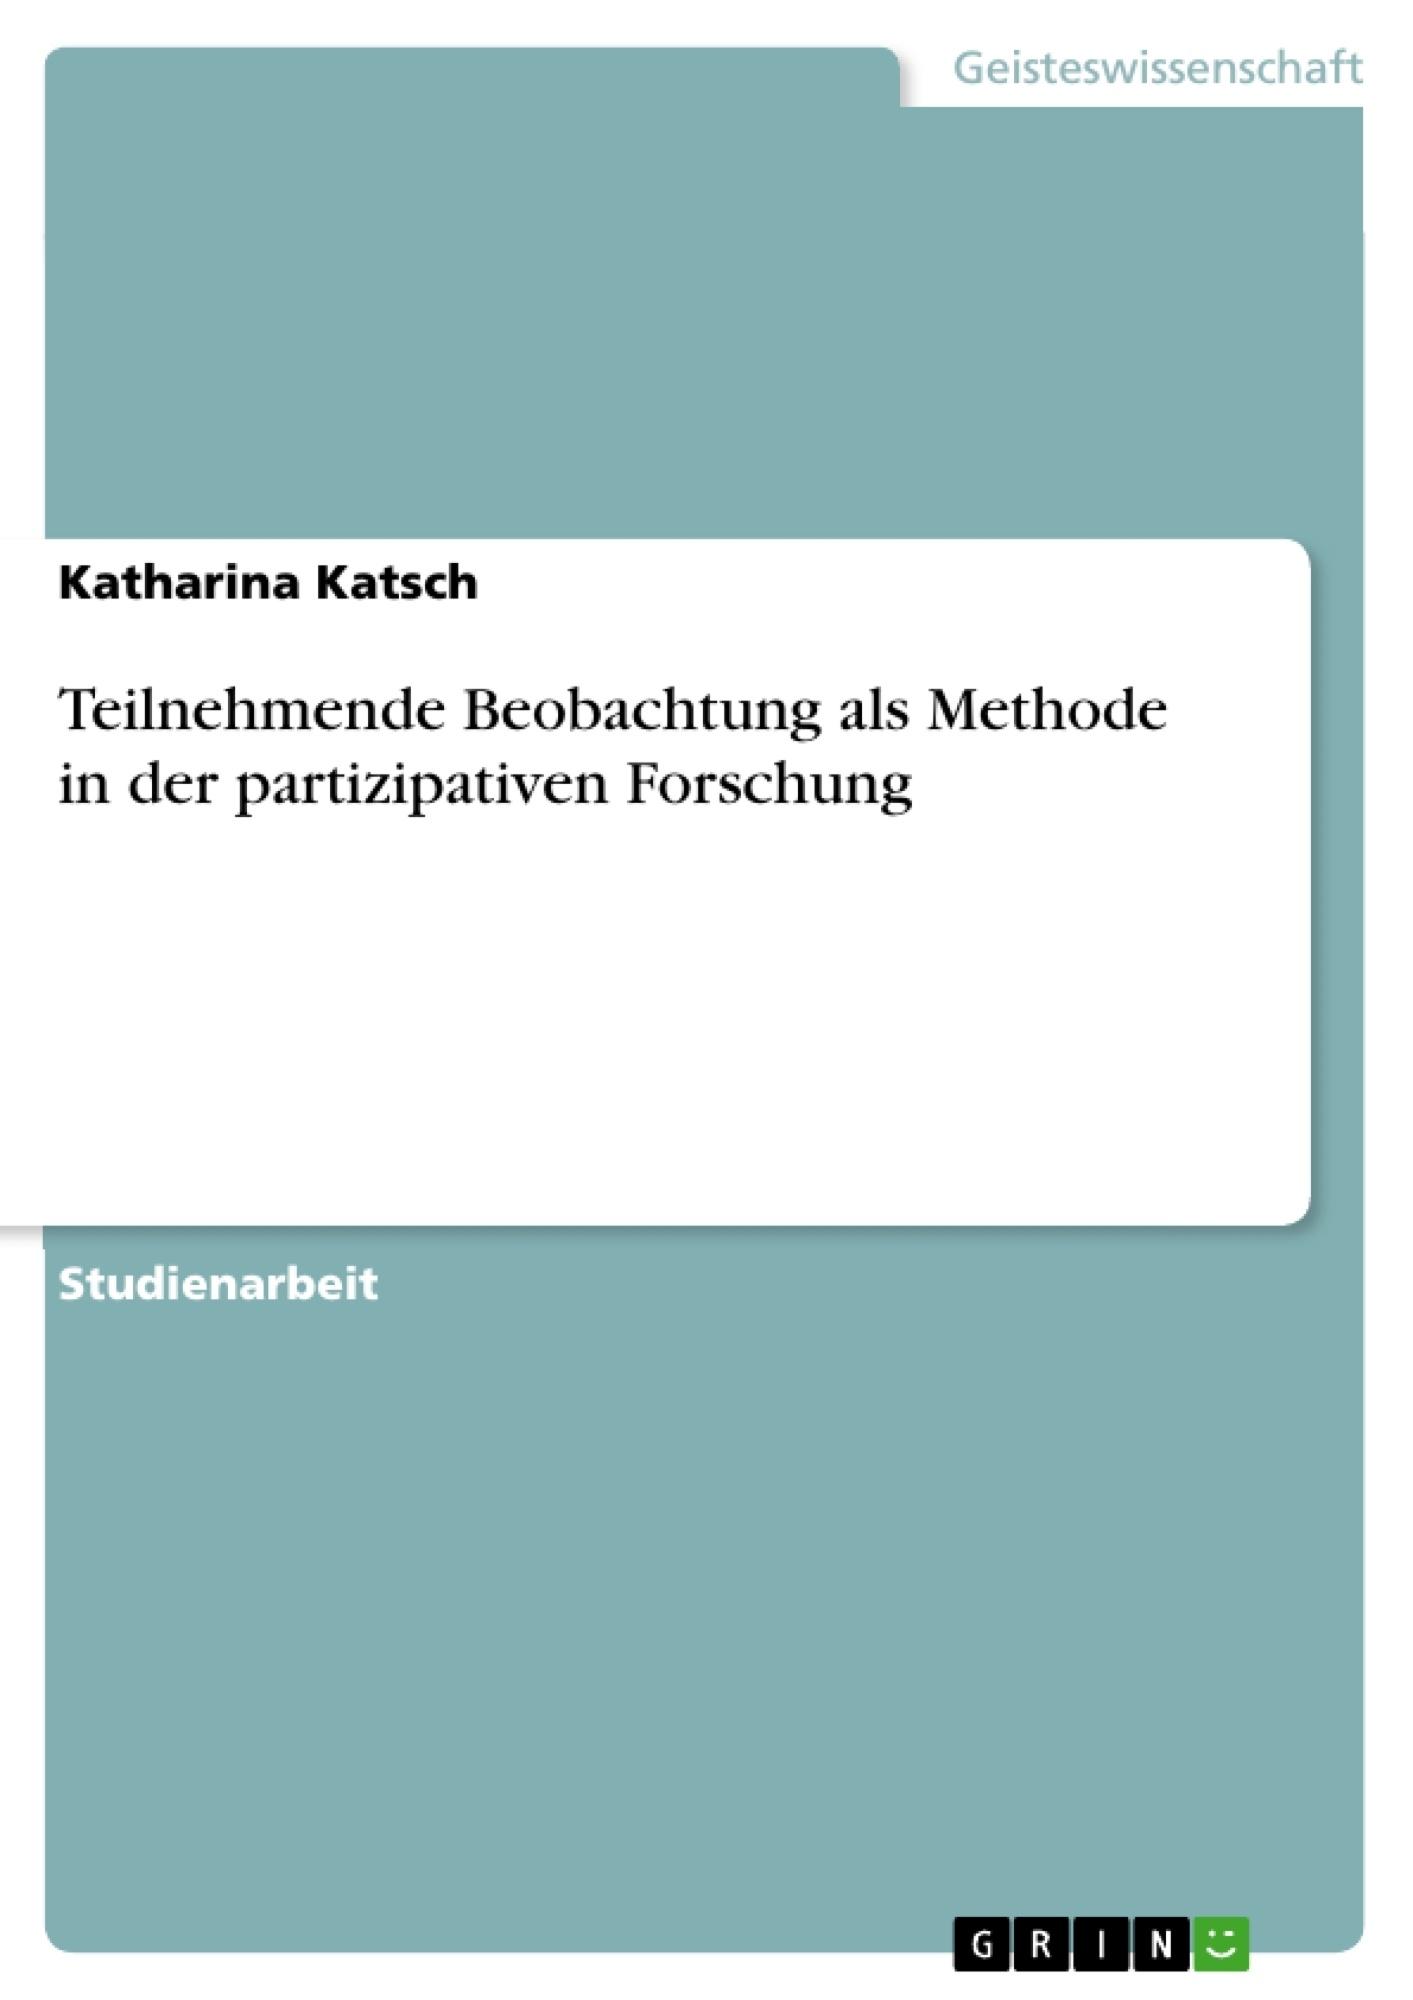 Titel: Teilnehmende Beobachtung als Methode in der partizipativen Forschung